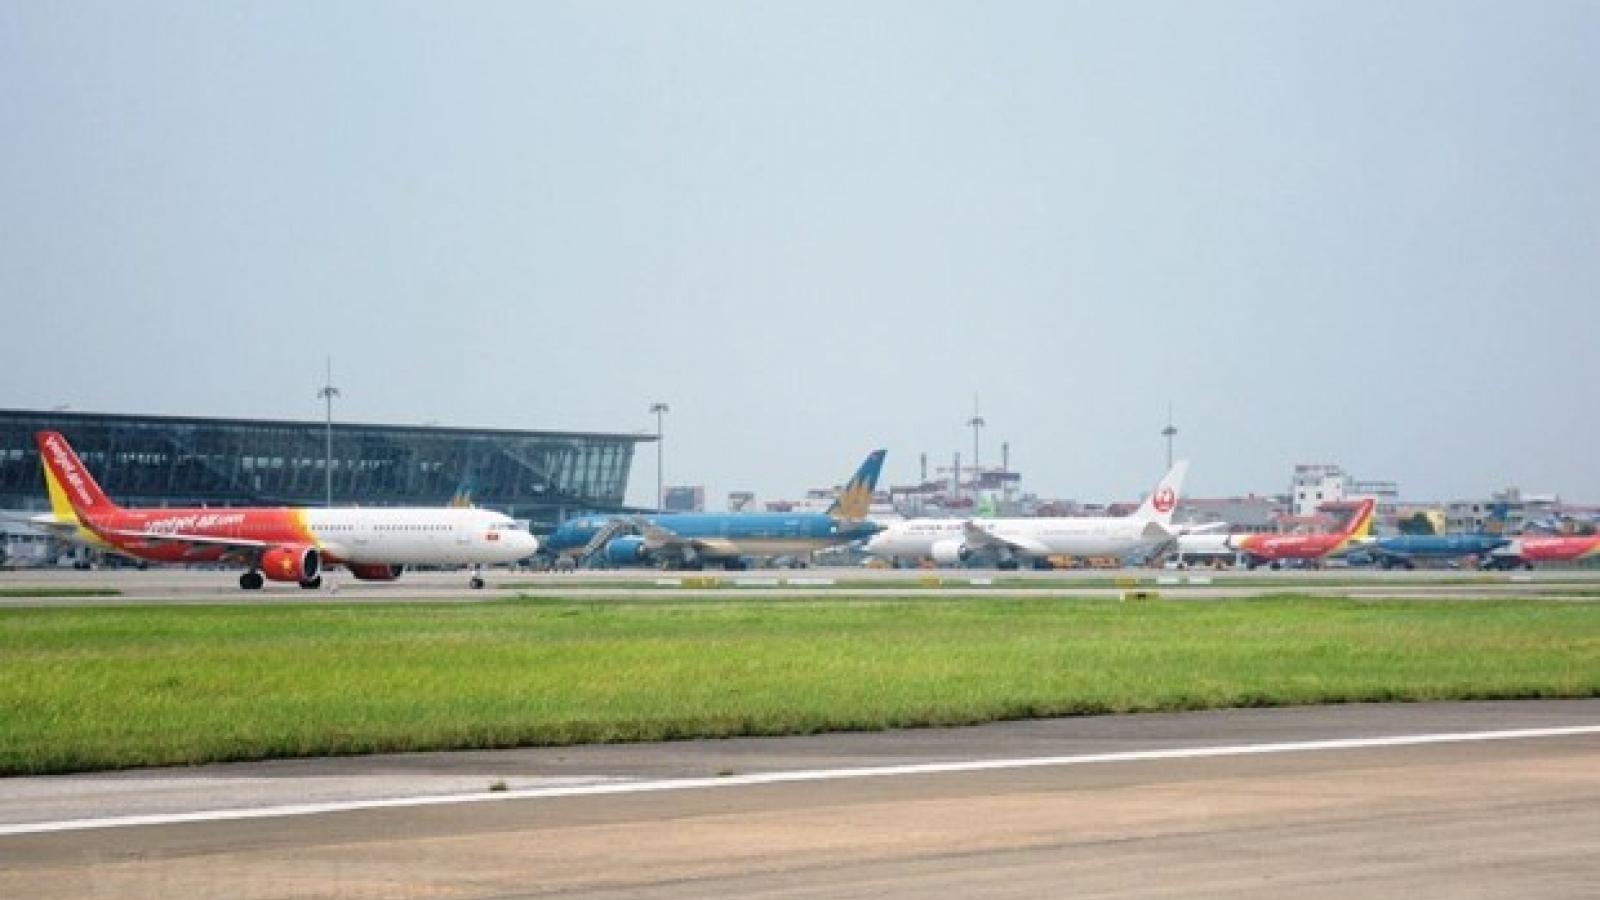 CAAV proposes halting flights to/from Tho Xuan, Phu Bai, Chu Lai airports